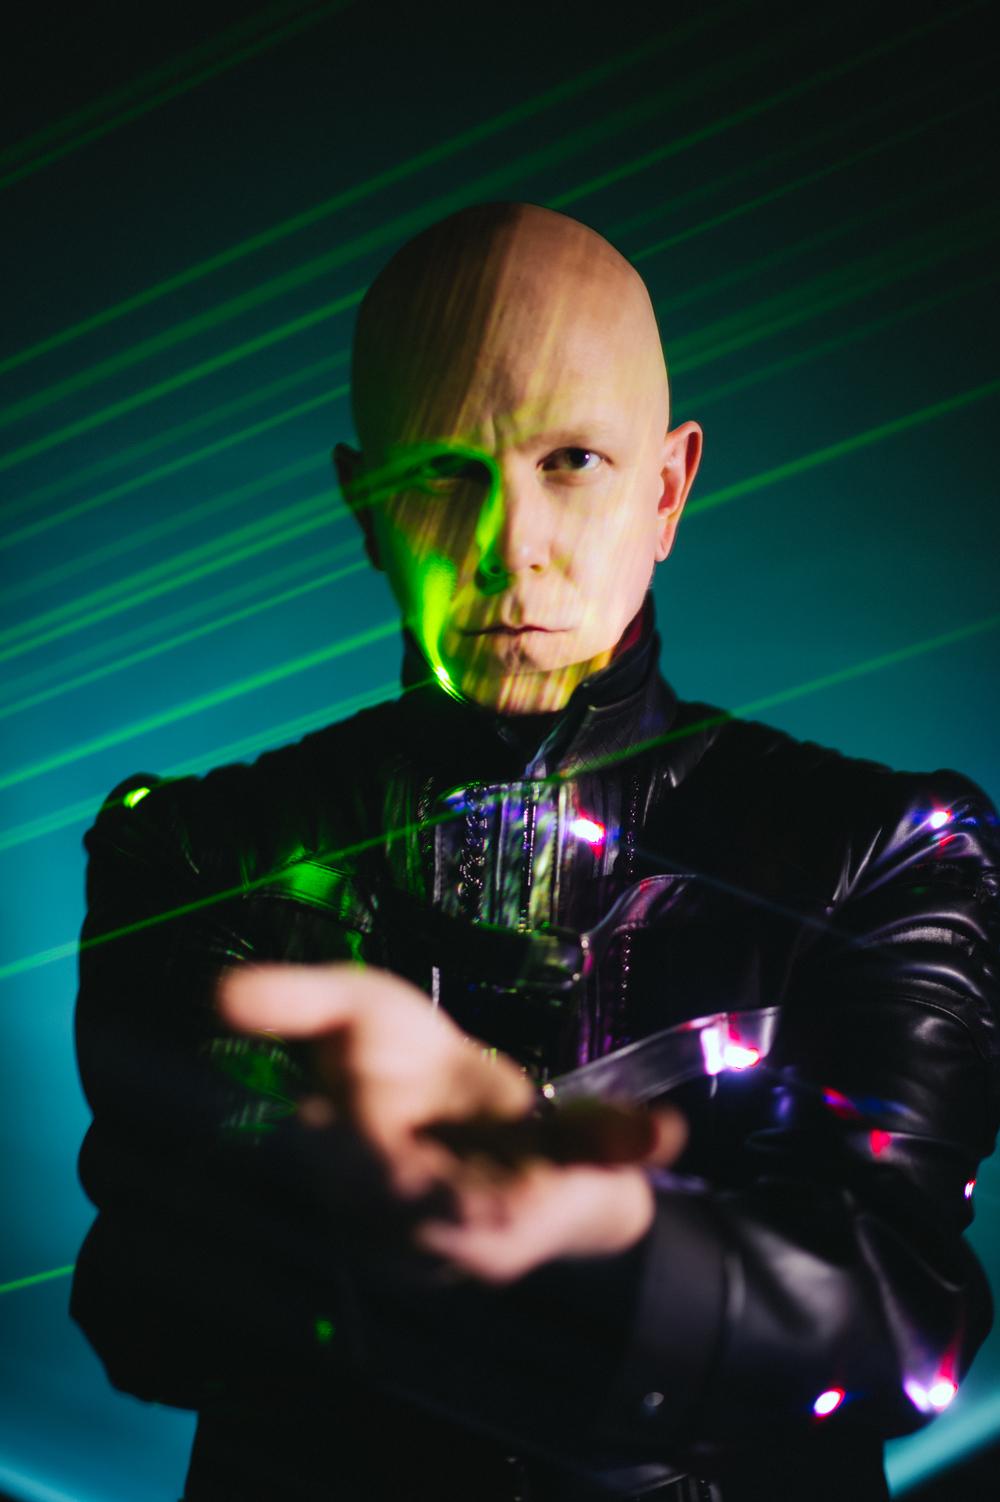 apis2015-laser-HIRES-3320-kuvaaja_Sami_Jämsén.jpg